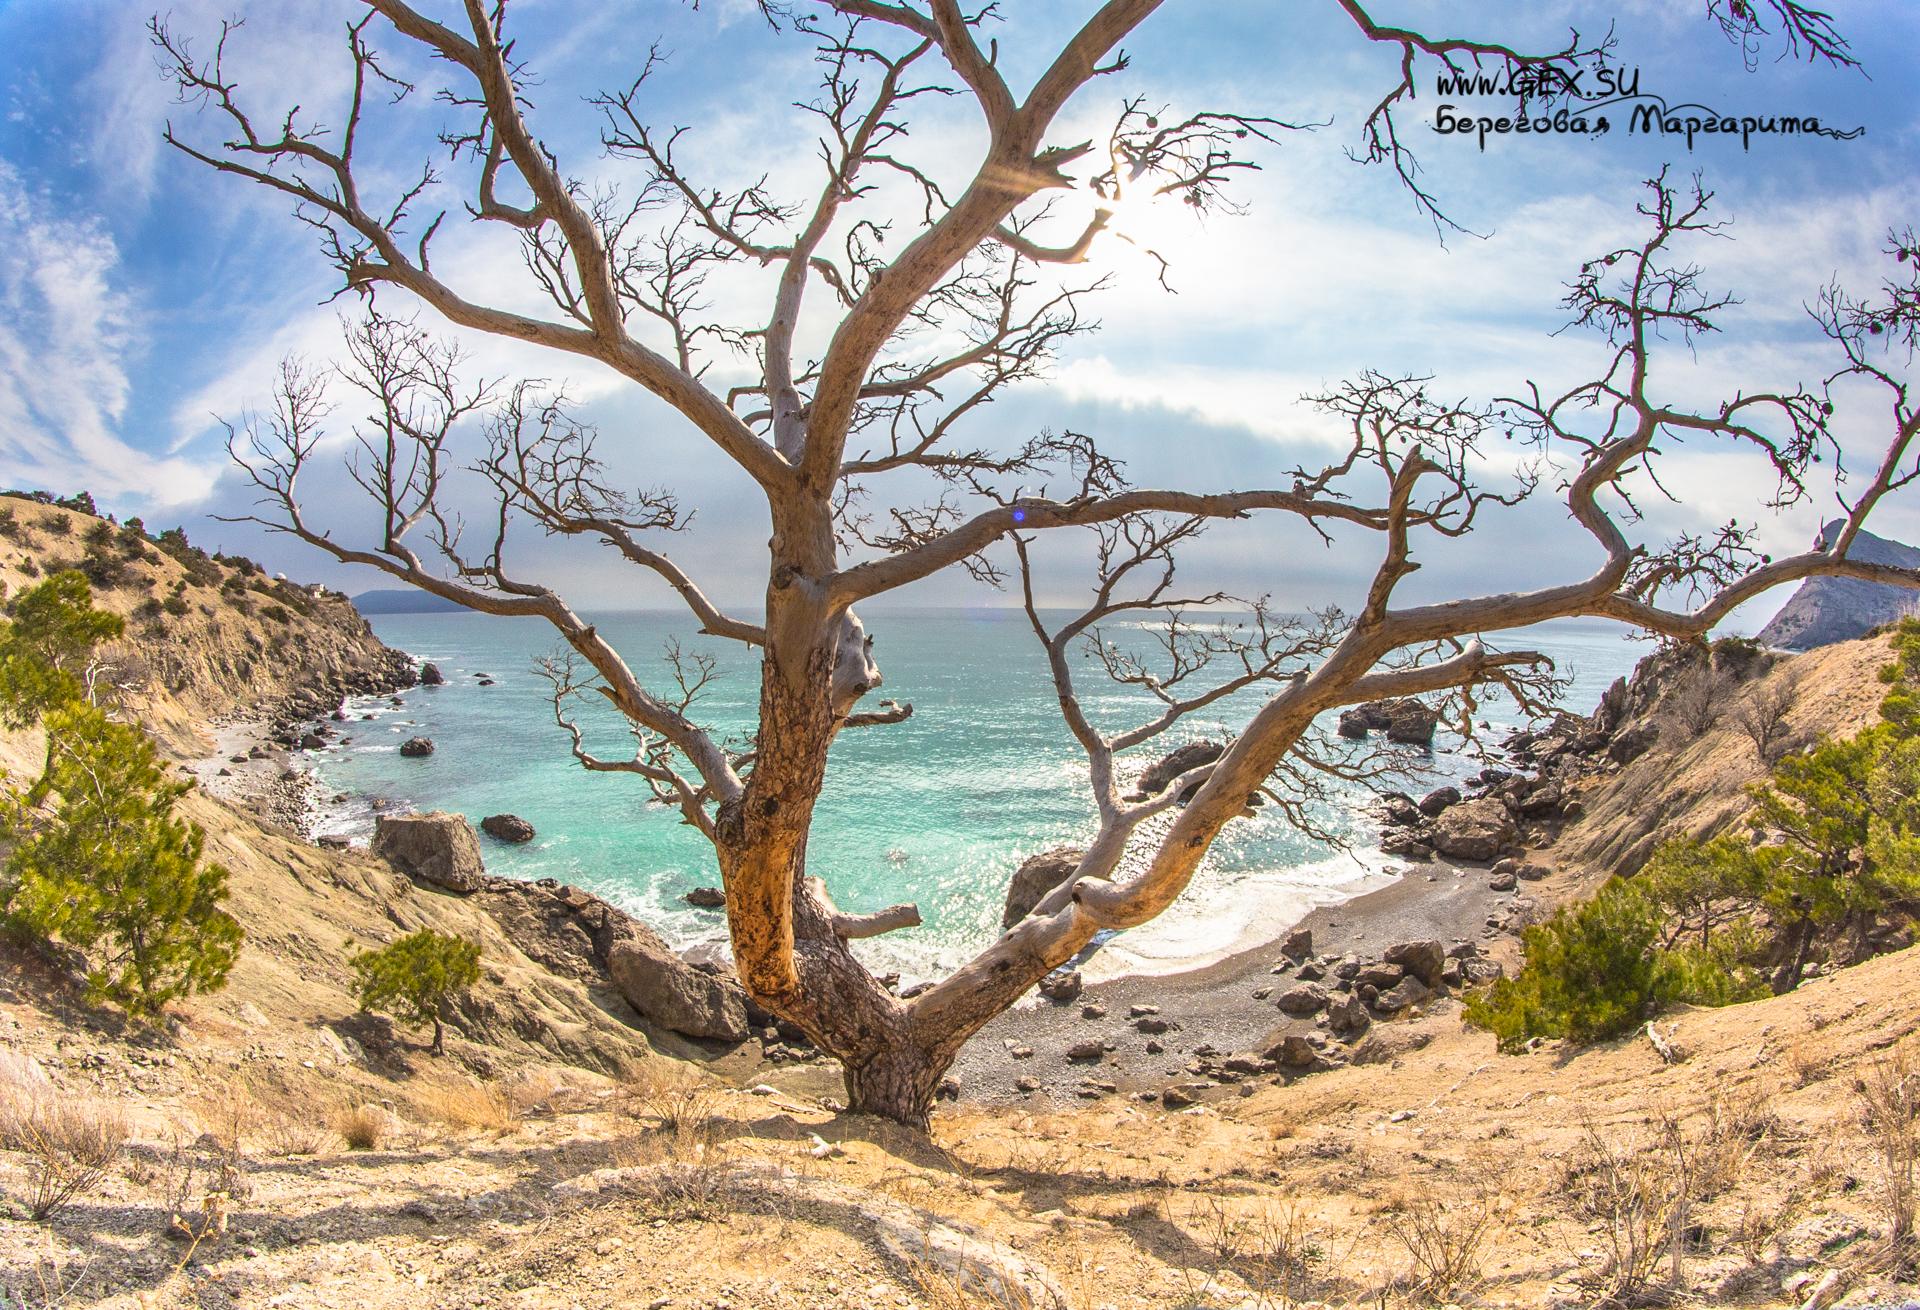 нудистский пляж Бухта Любви